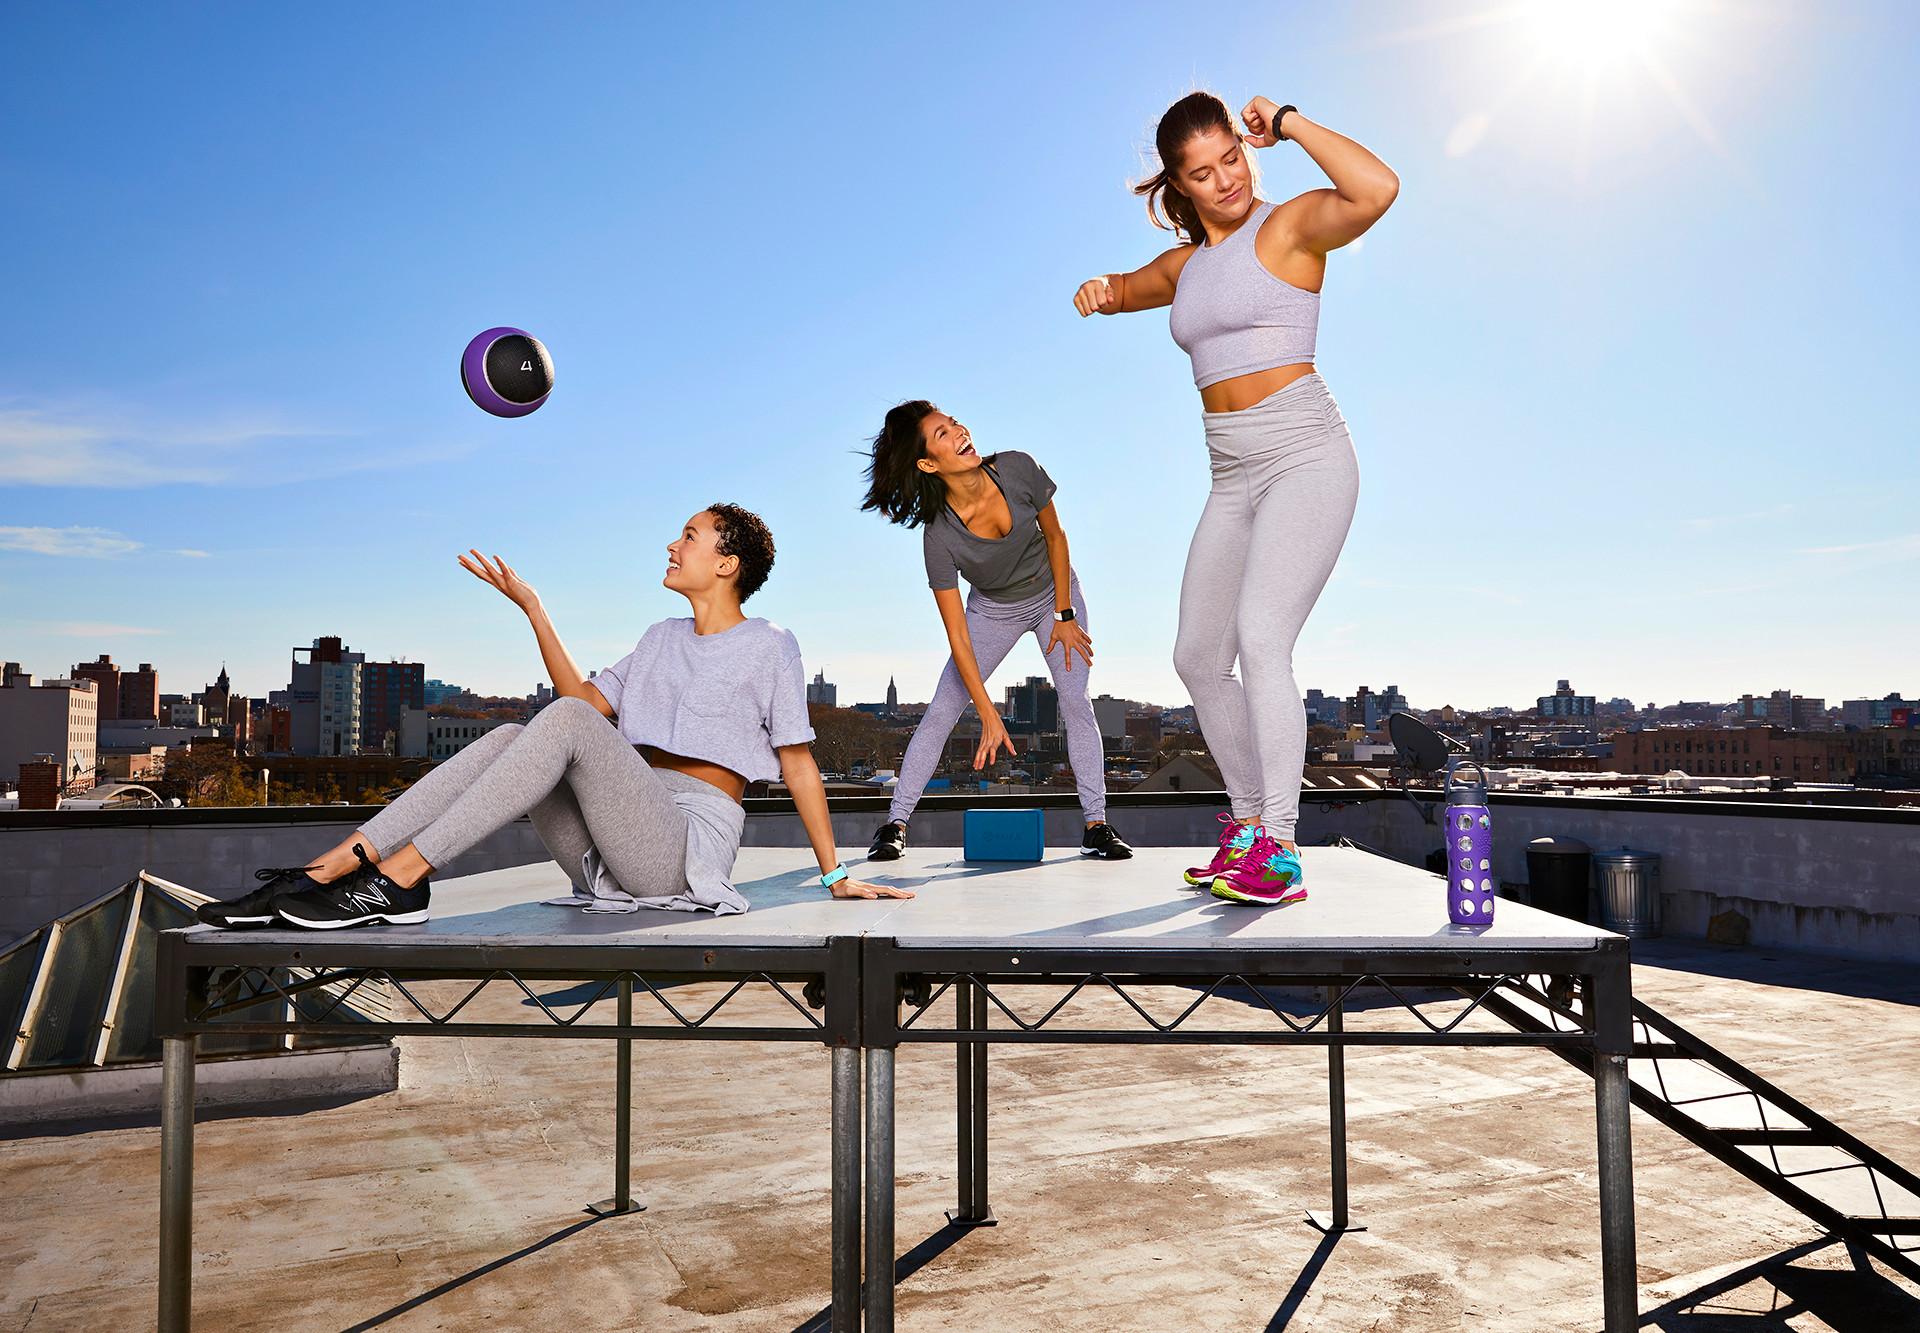 Wellness+Day+1_Shot+01_0125_1.jpg